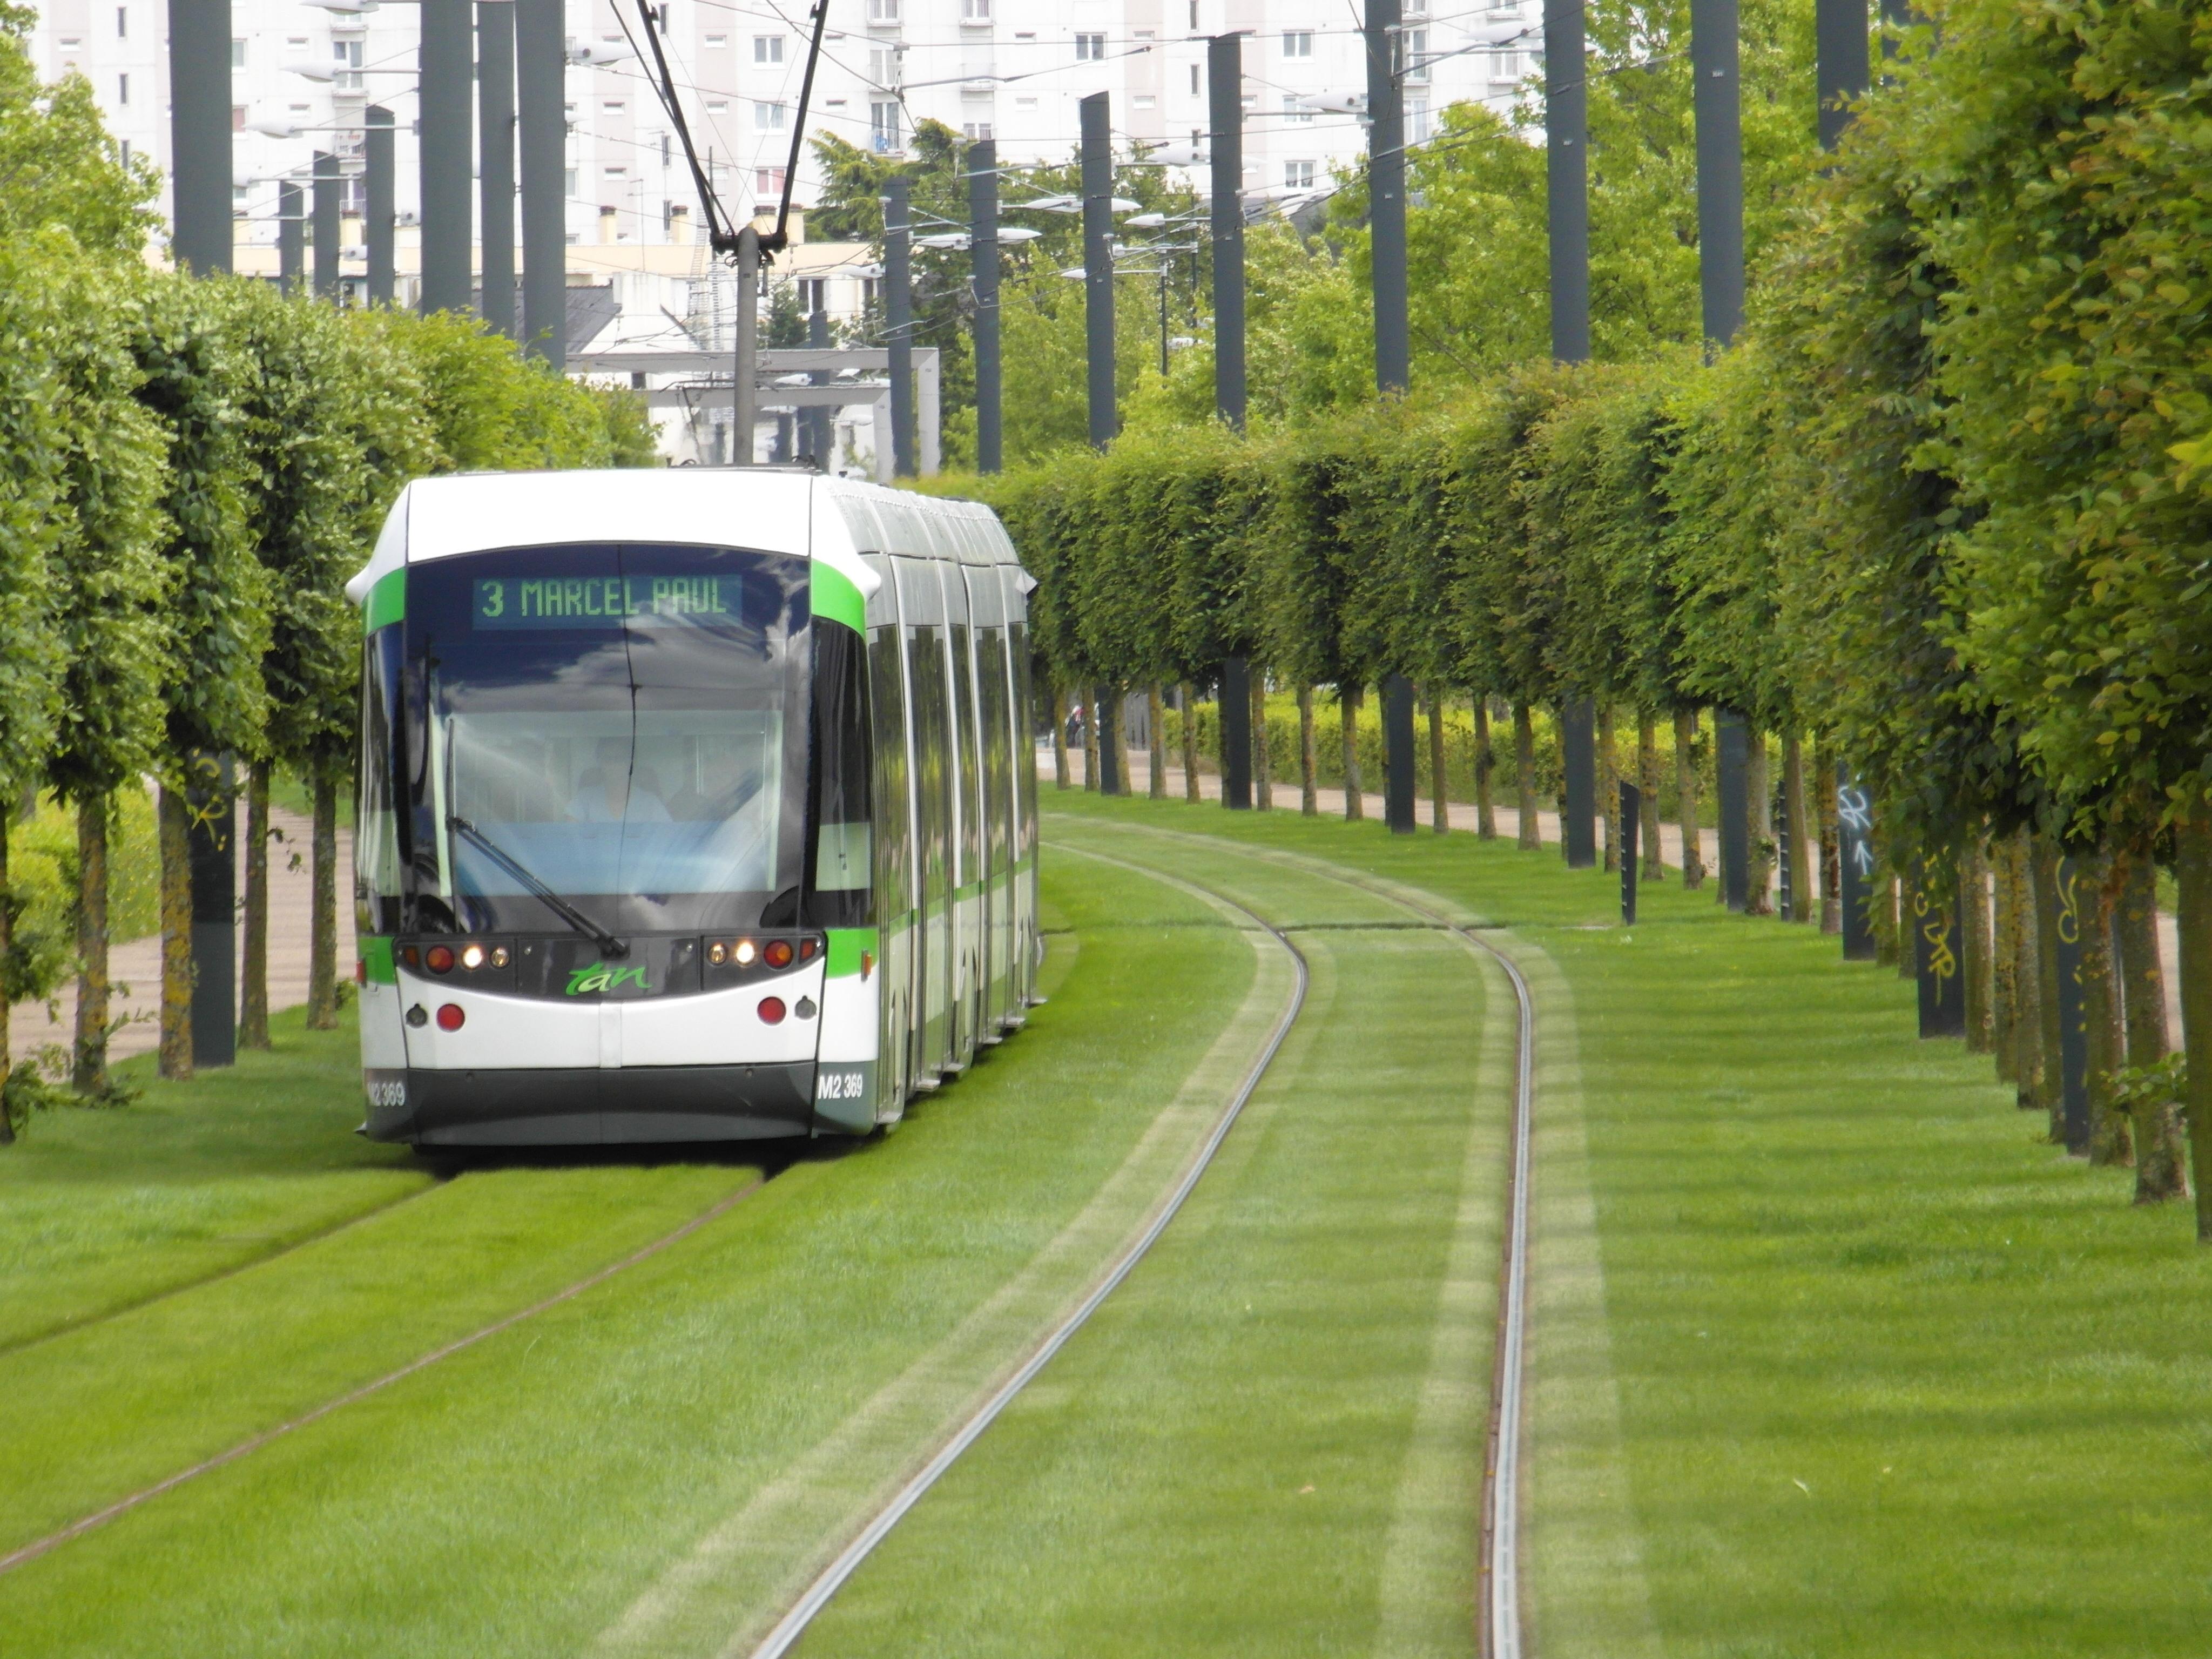 Flickr_-_IngolfBLN_-_Nantes_-_Tramway_-_Ligne_3_-_Orvault_(17)